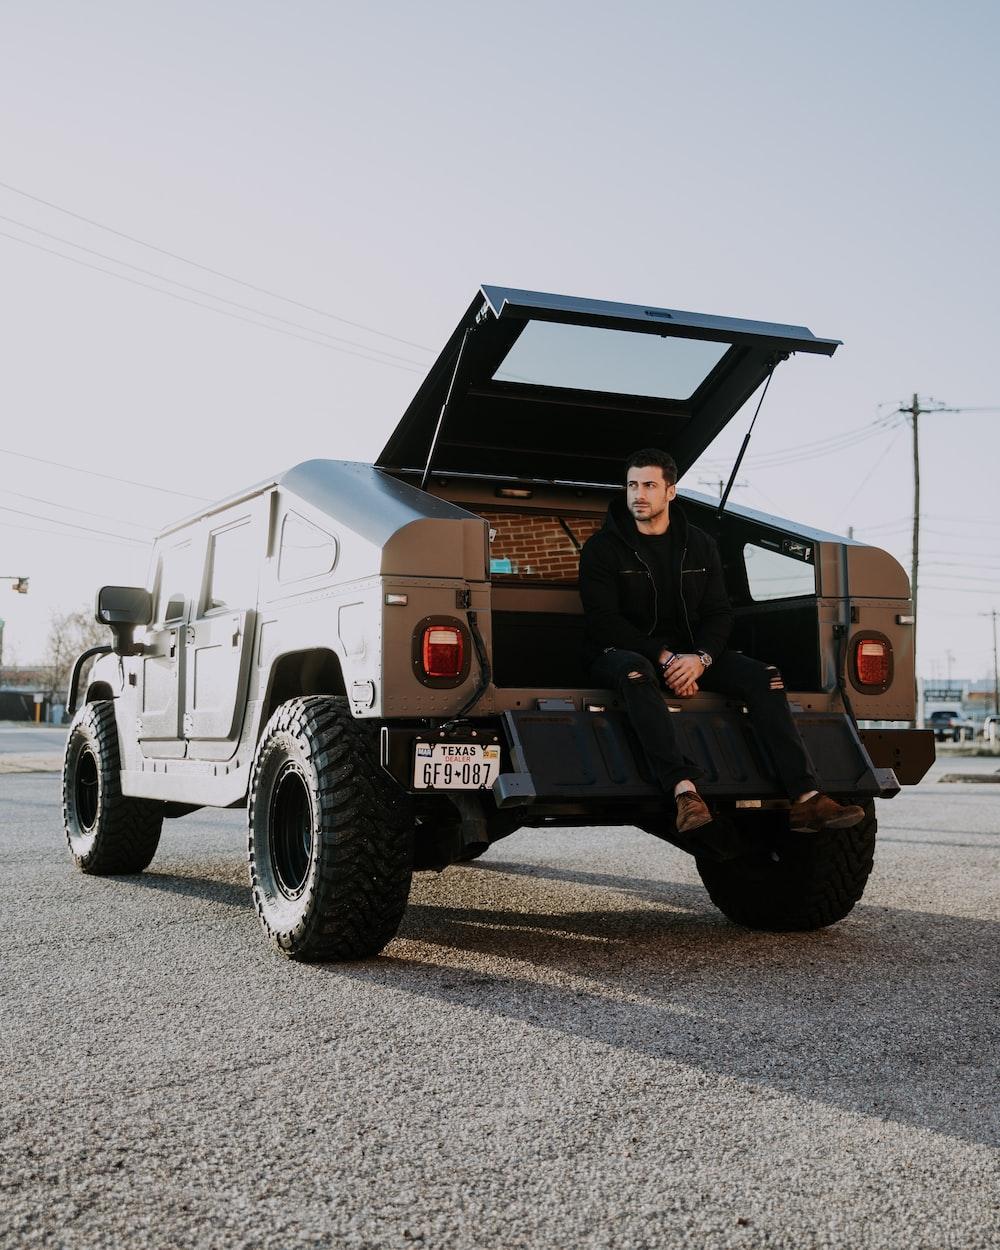 man sitting on vehicle